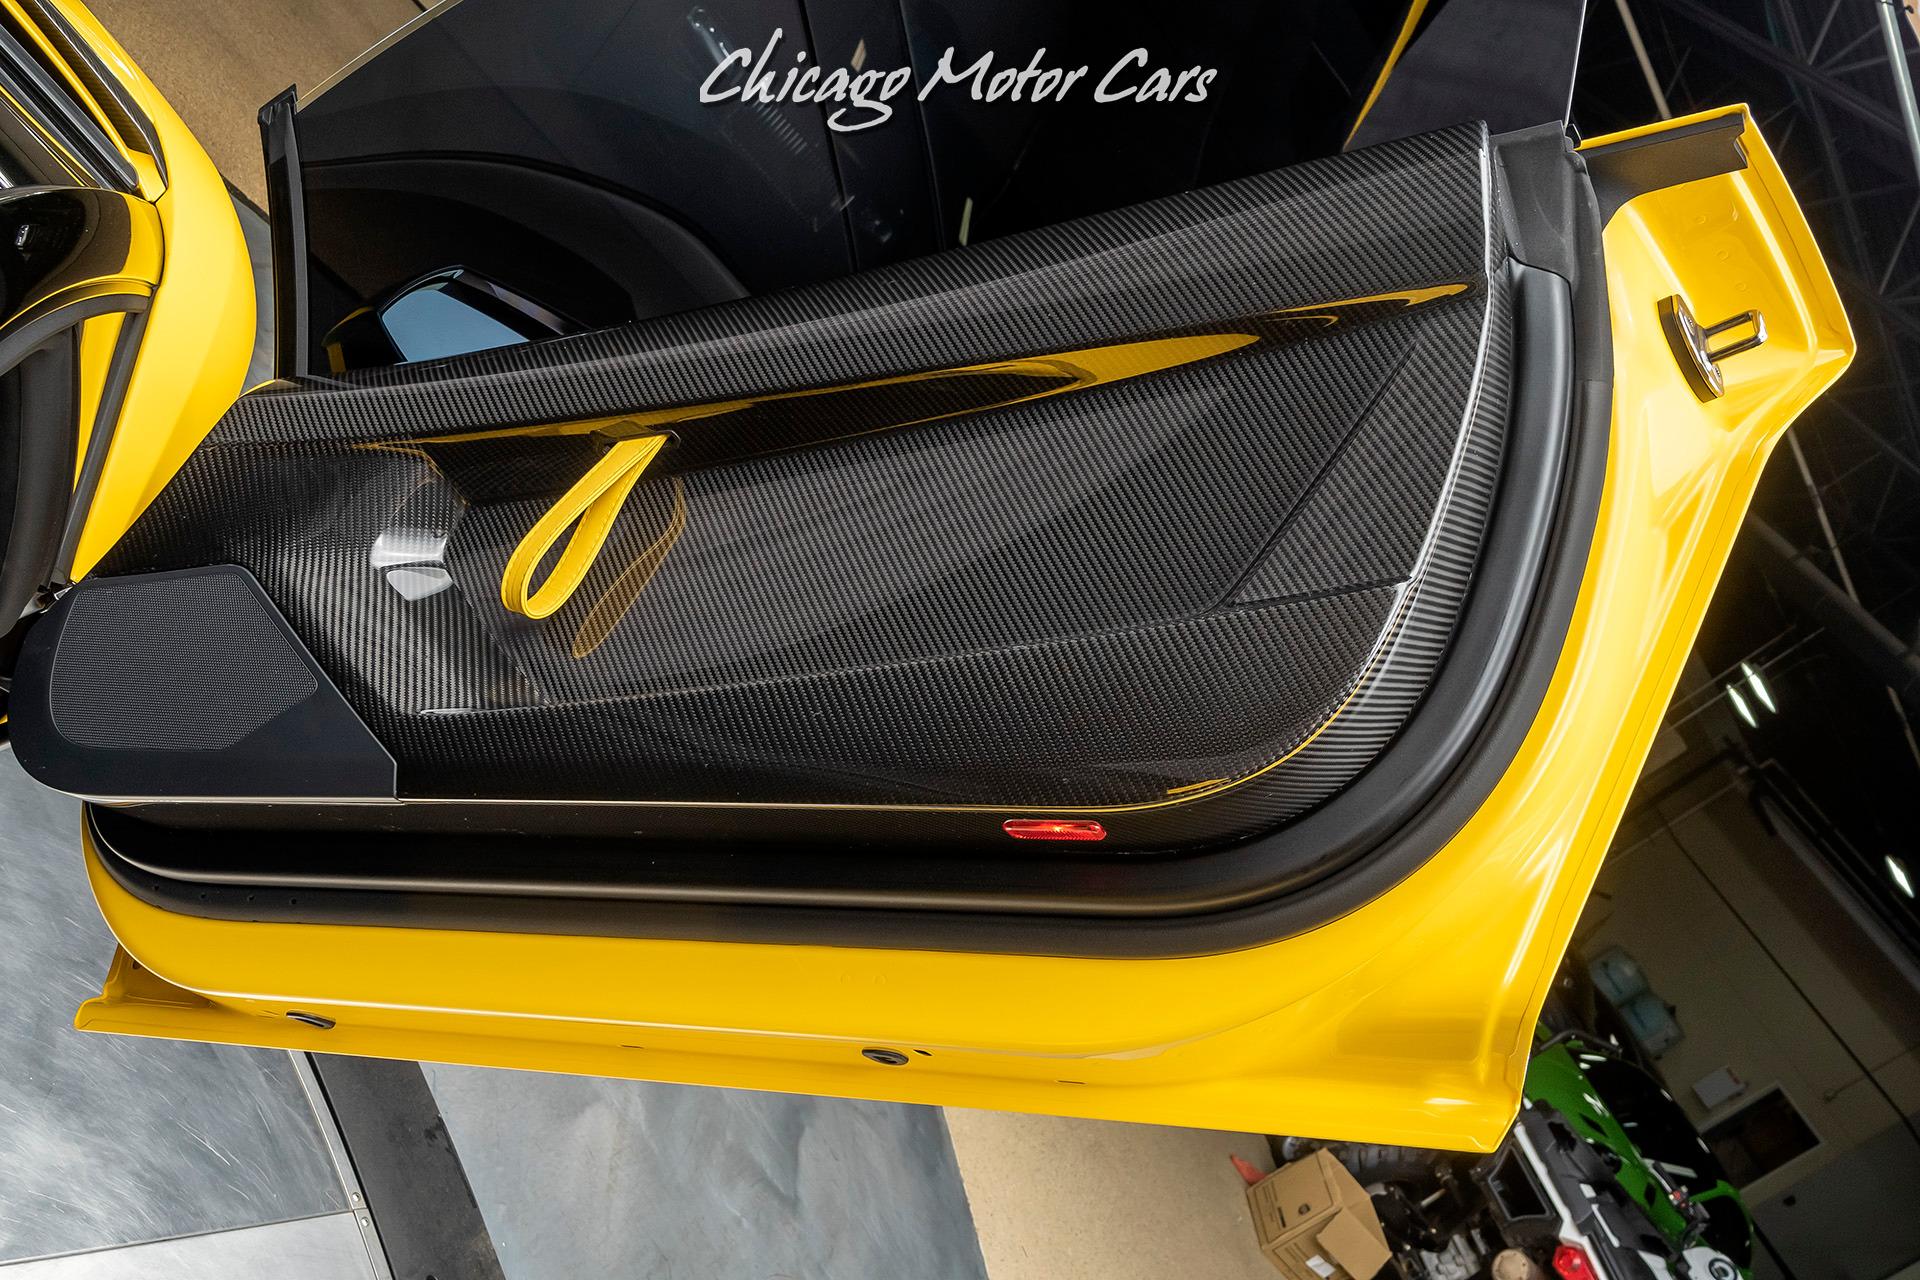 Used-2020-Lamborghini-Aventador-SVJ-LP770-4-Roadster-Only-1k-Miles-New-Giallo-Orion-RARE-PPF